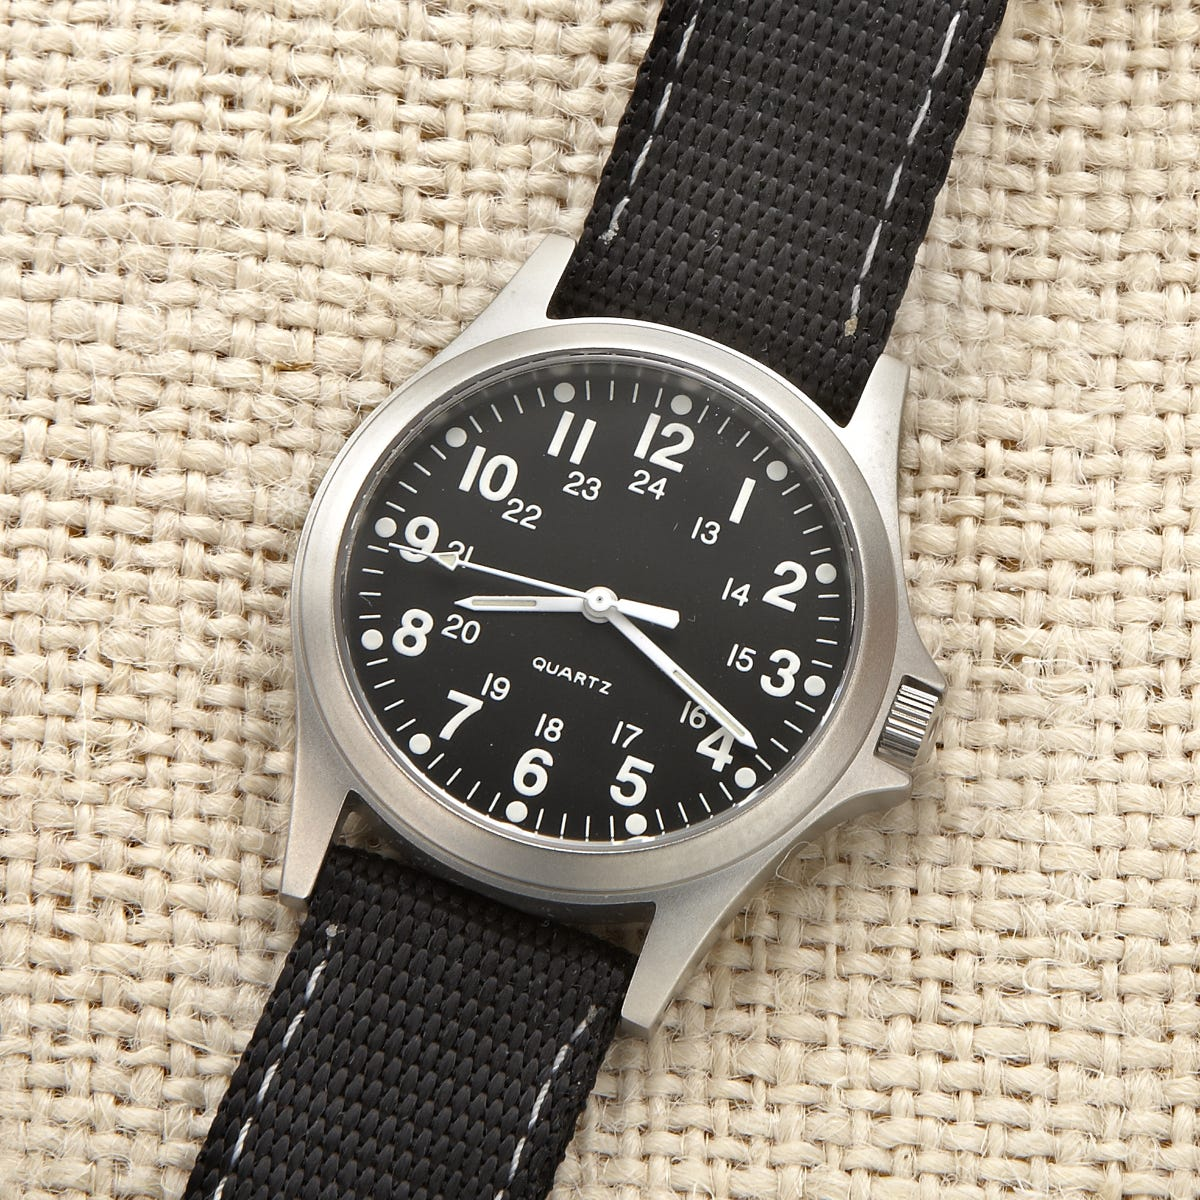 rugged wwii military watch (black band)